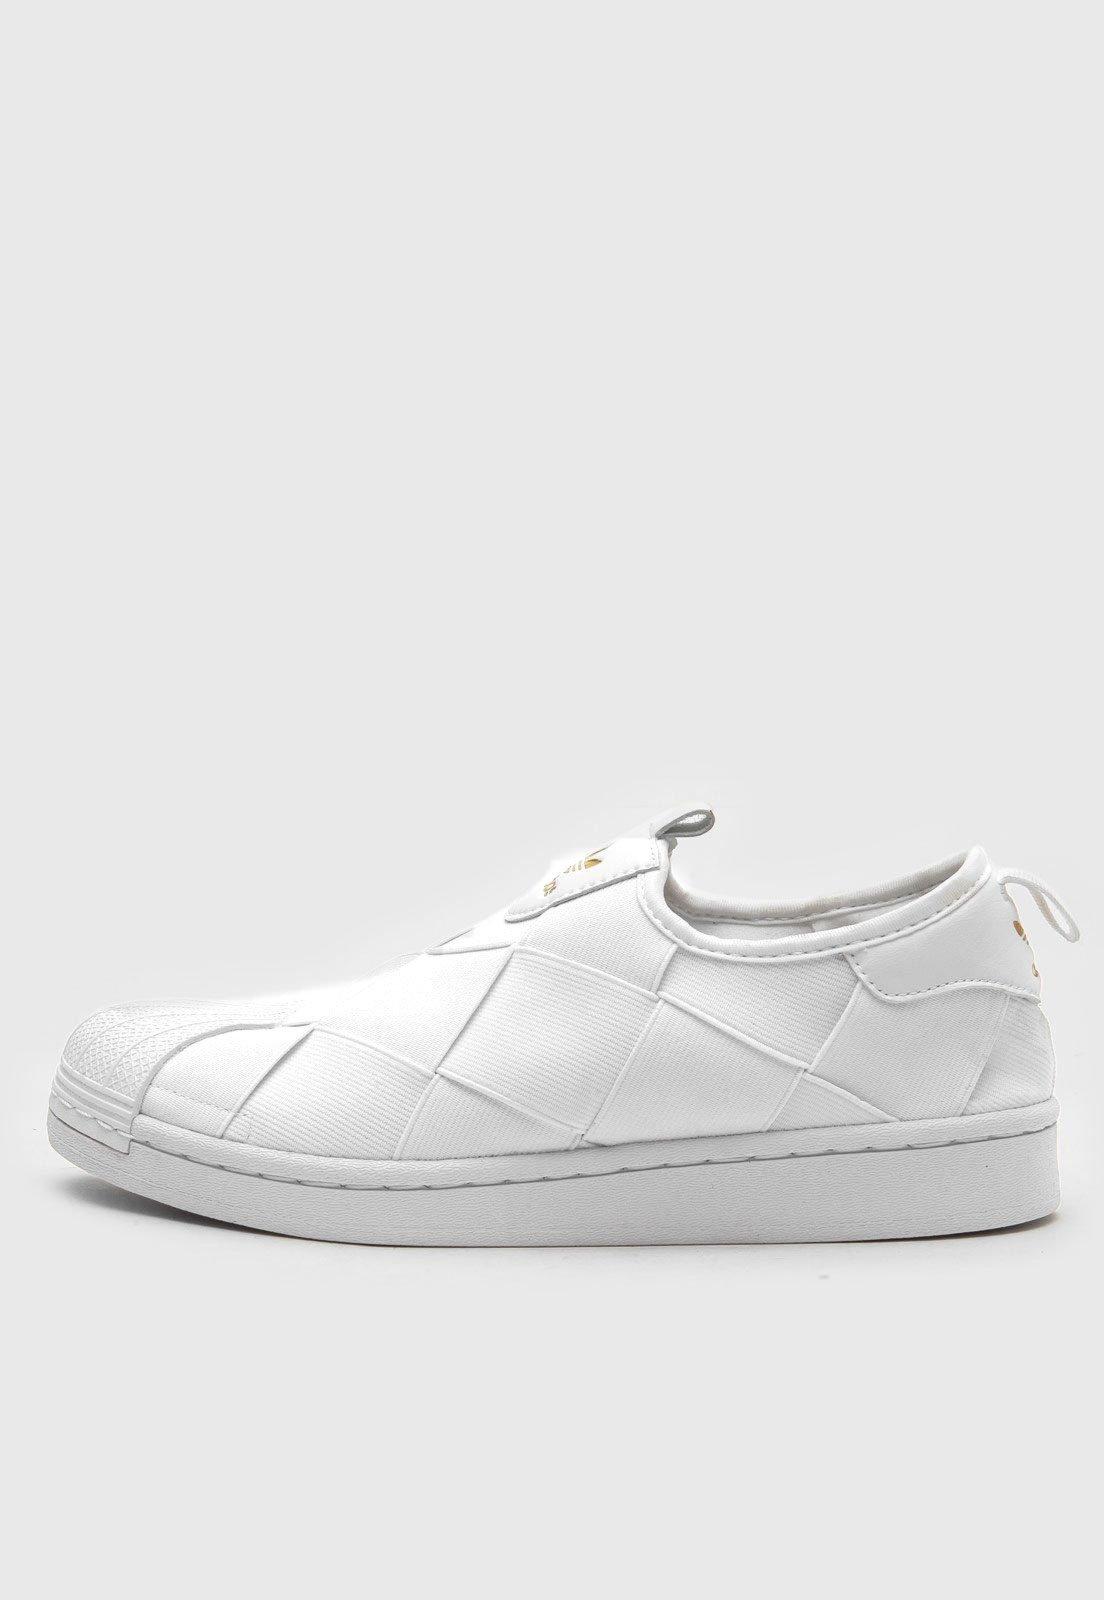 Tênis adidas Originals Superstar Slip On W Branco - Marca adidas Originals